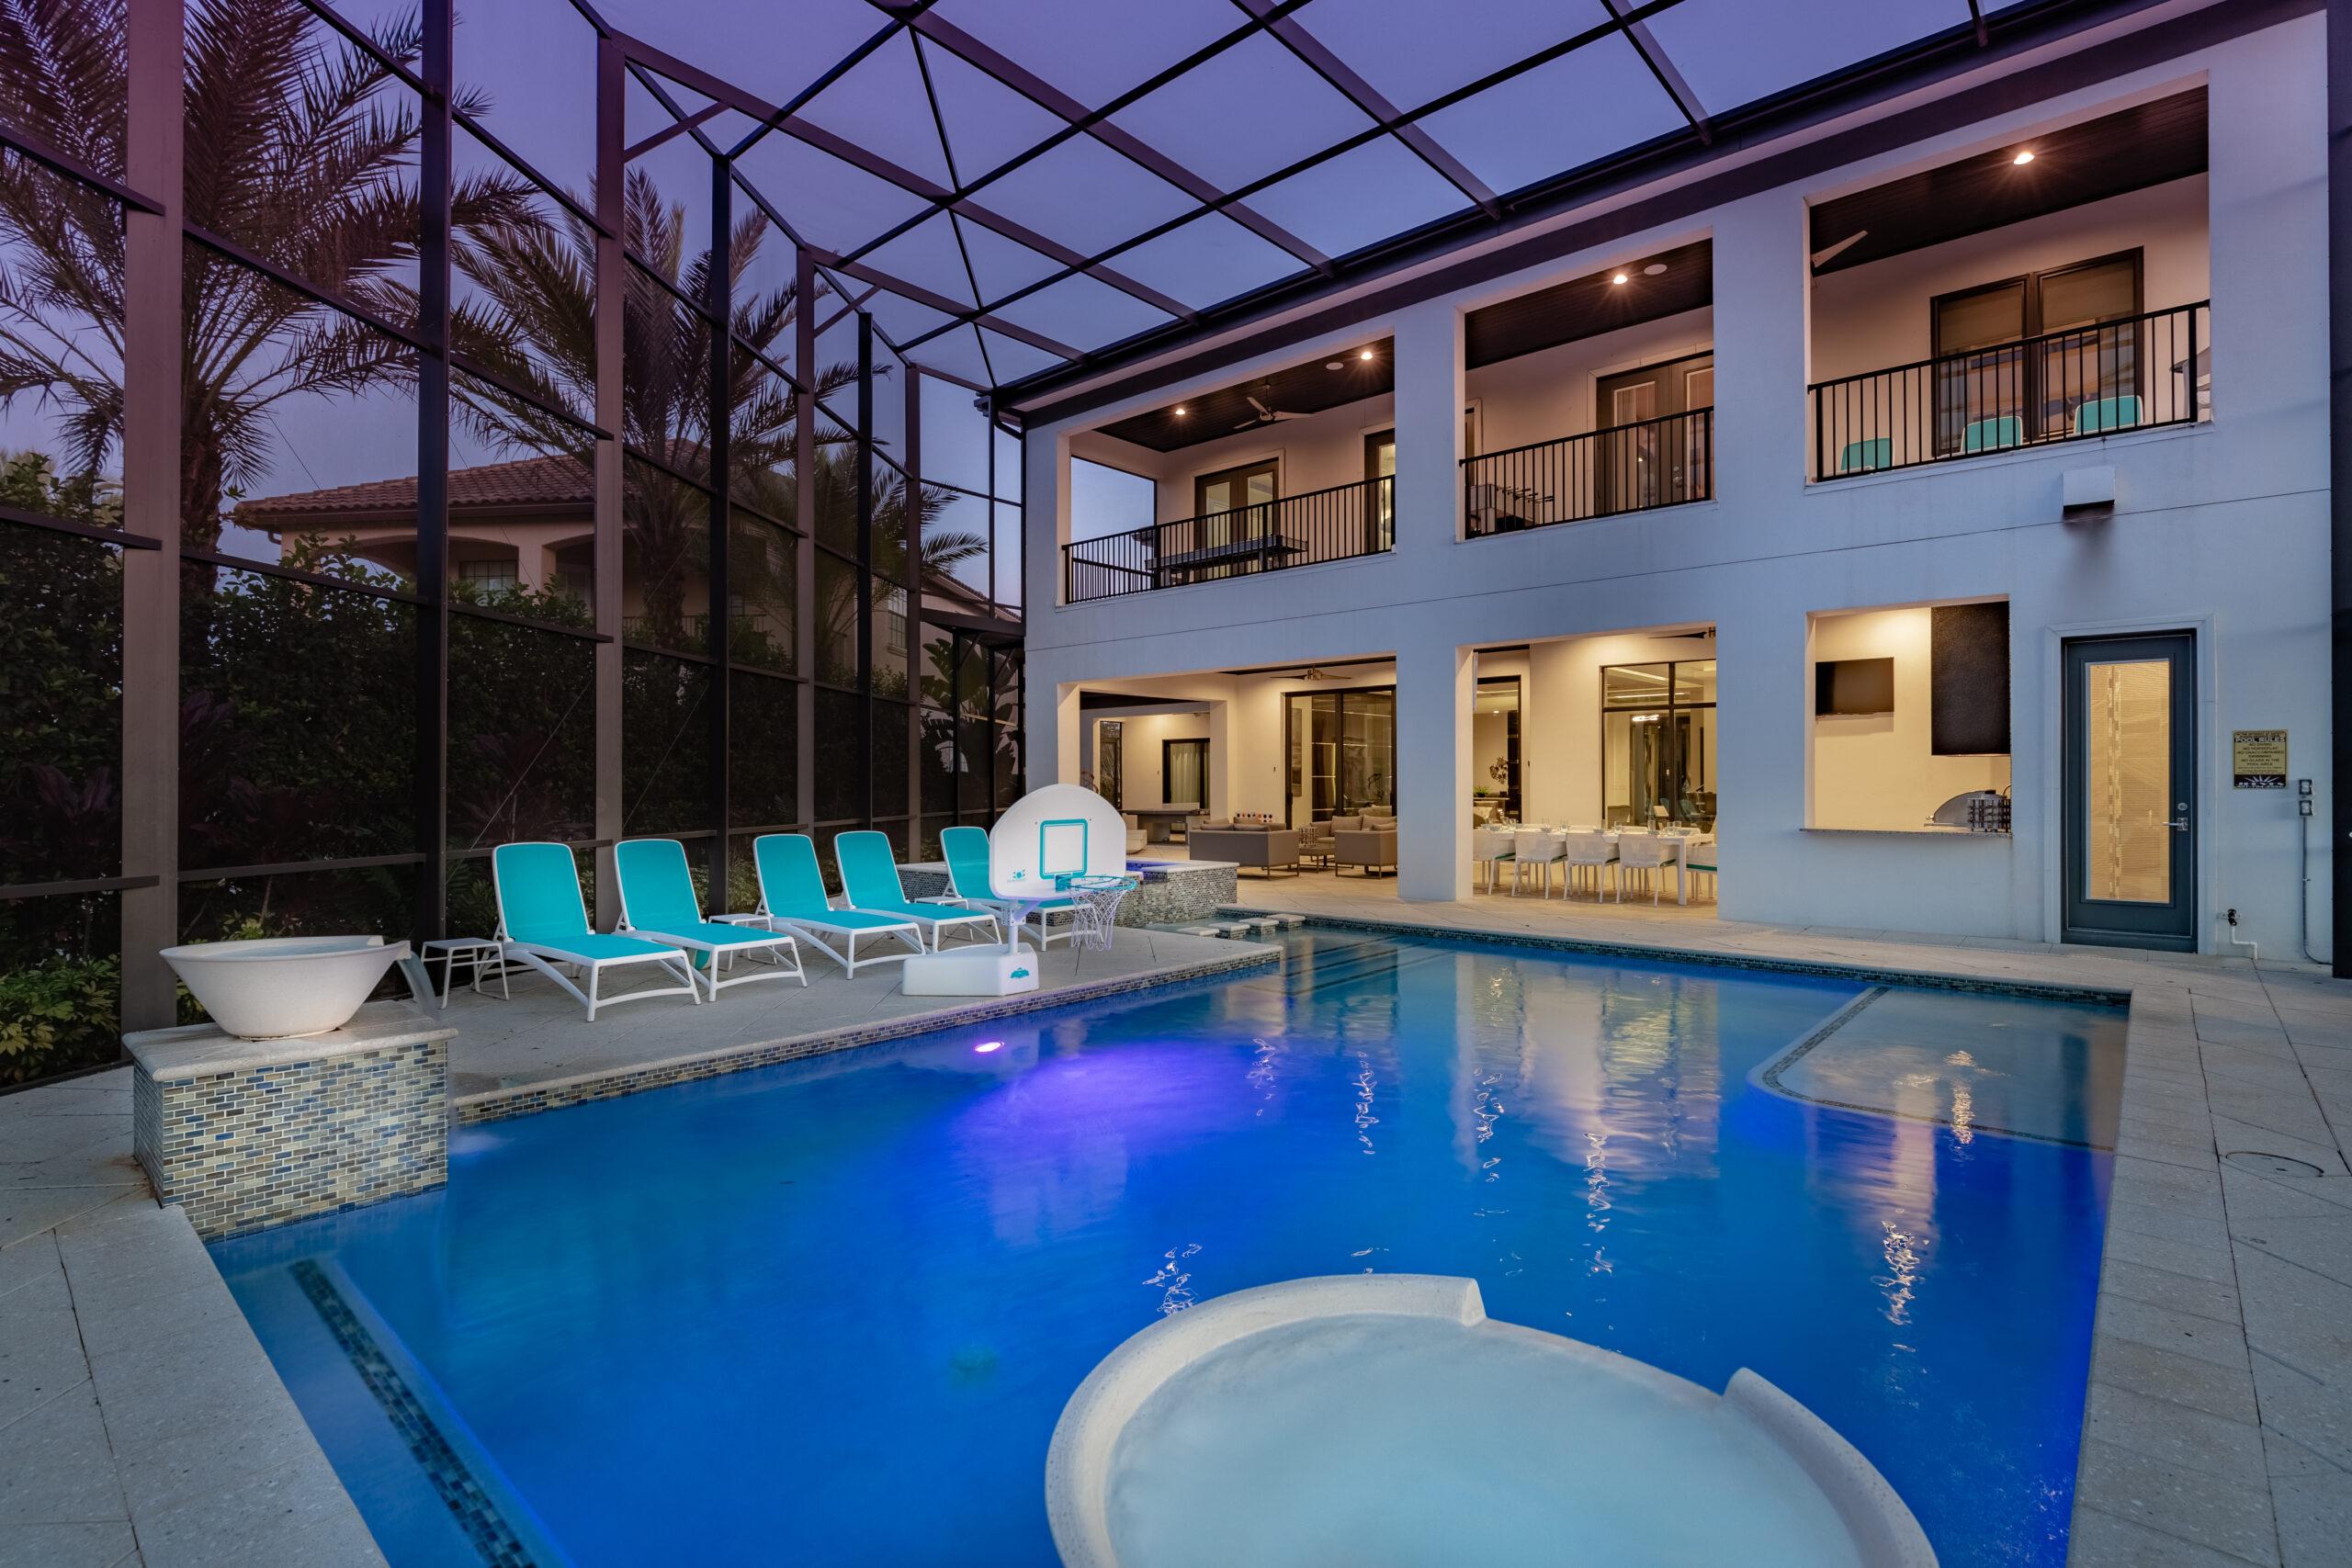 reunion resort by orlando fun rentals